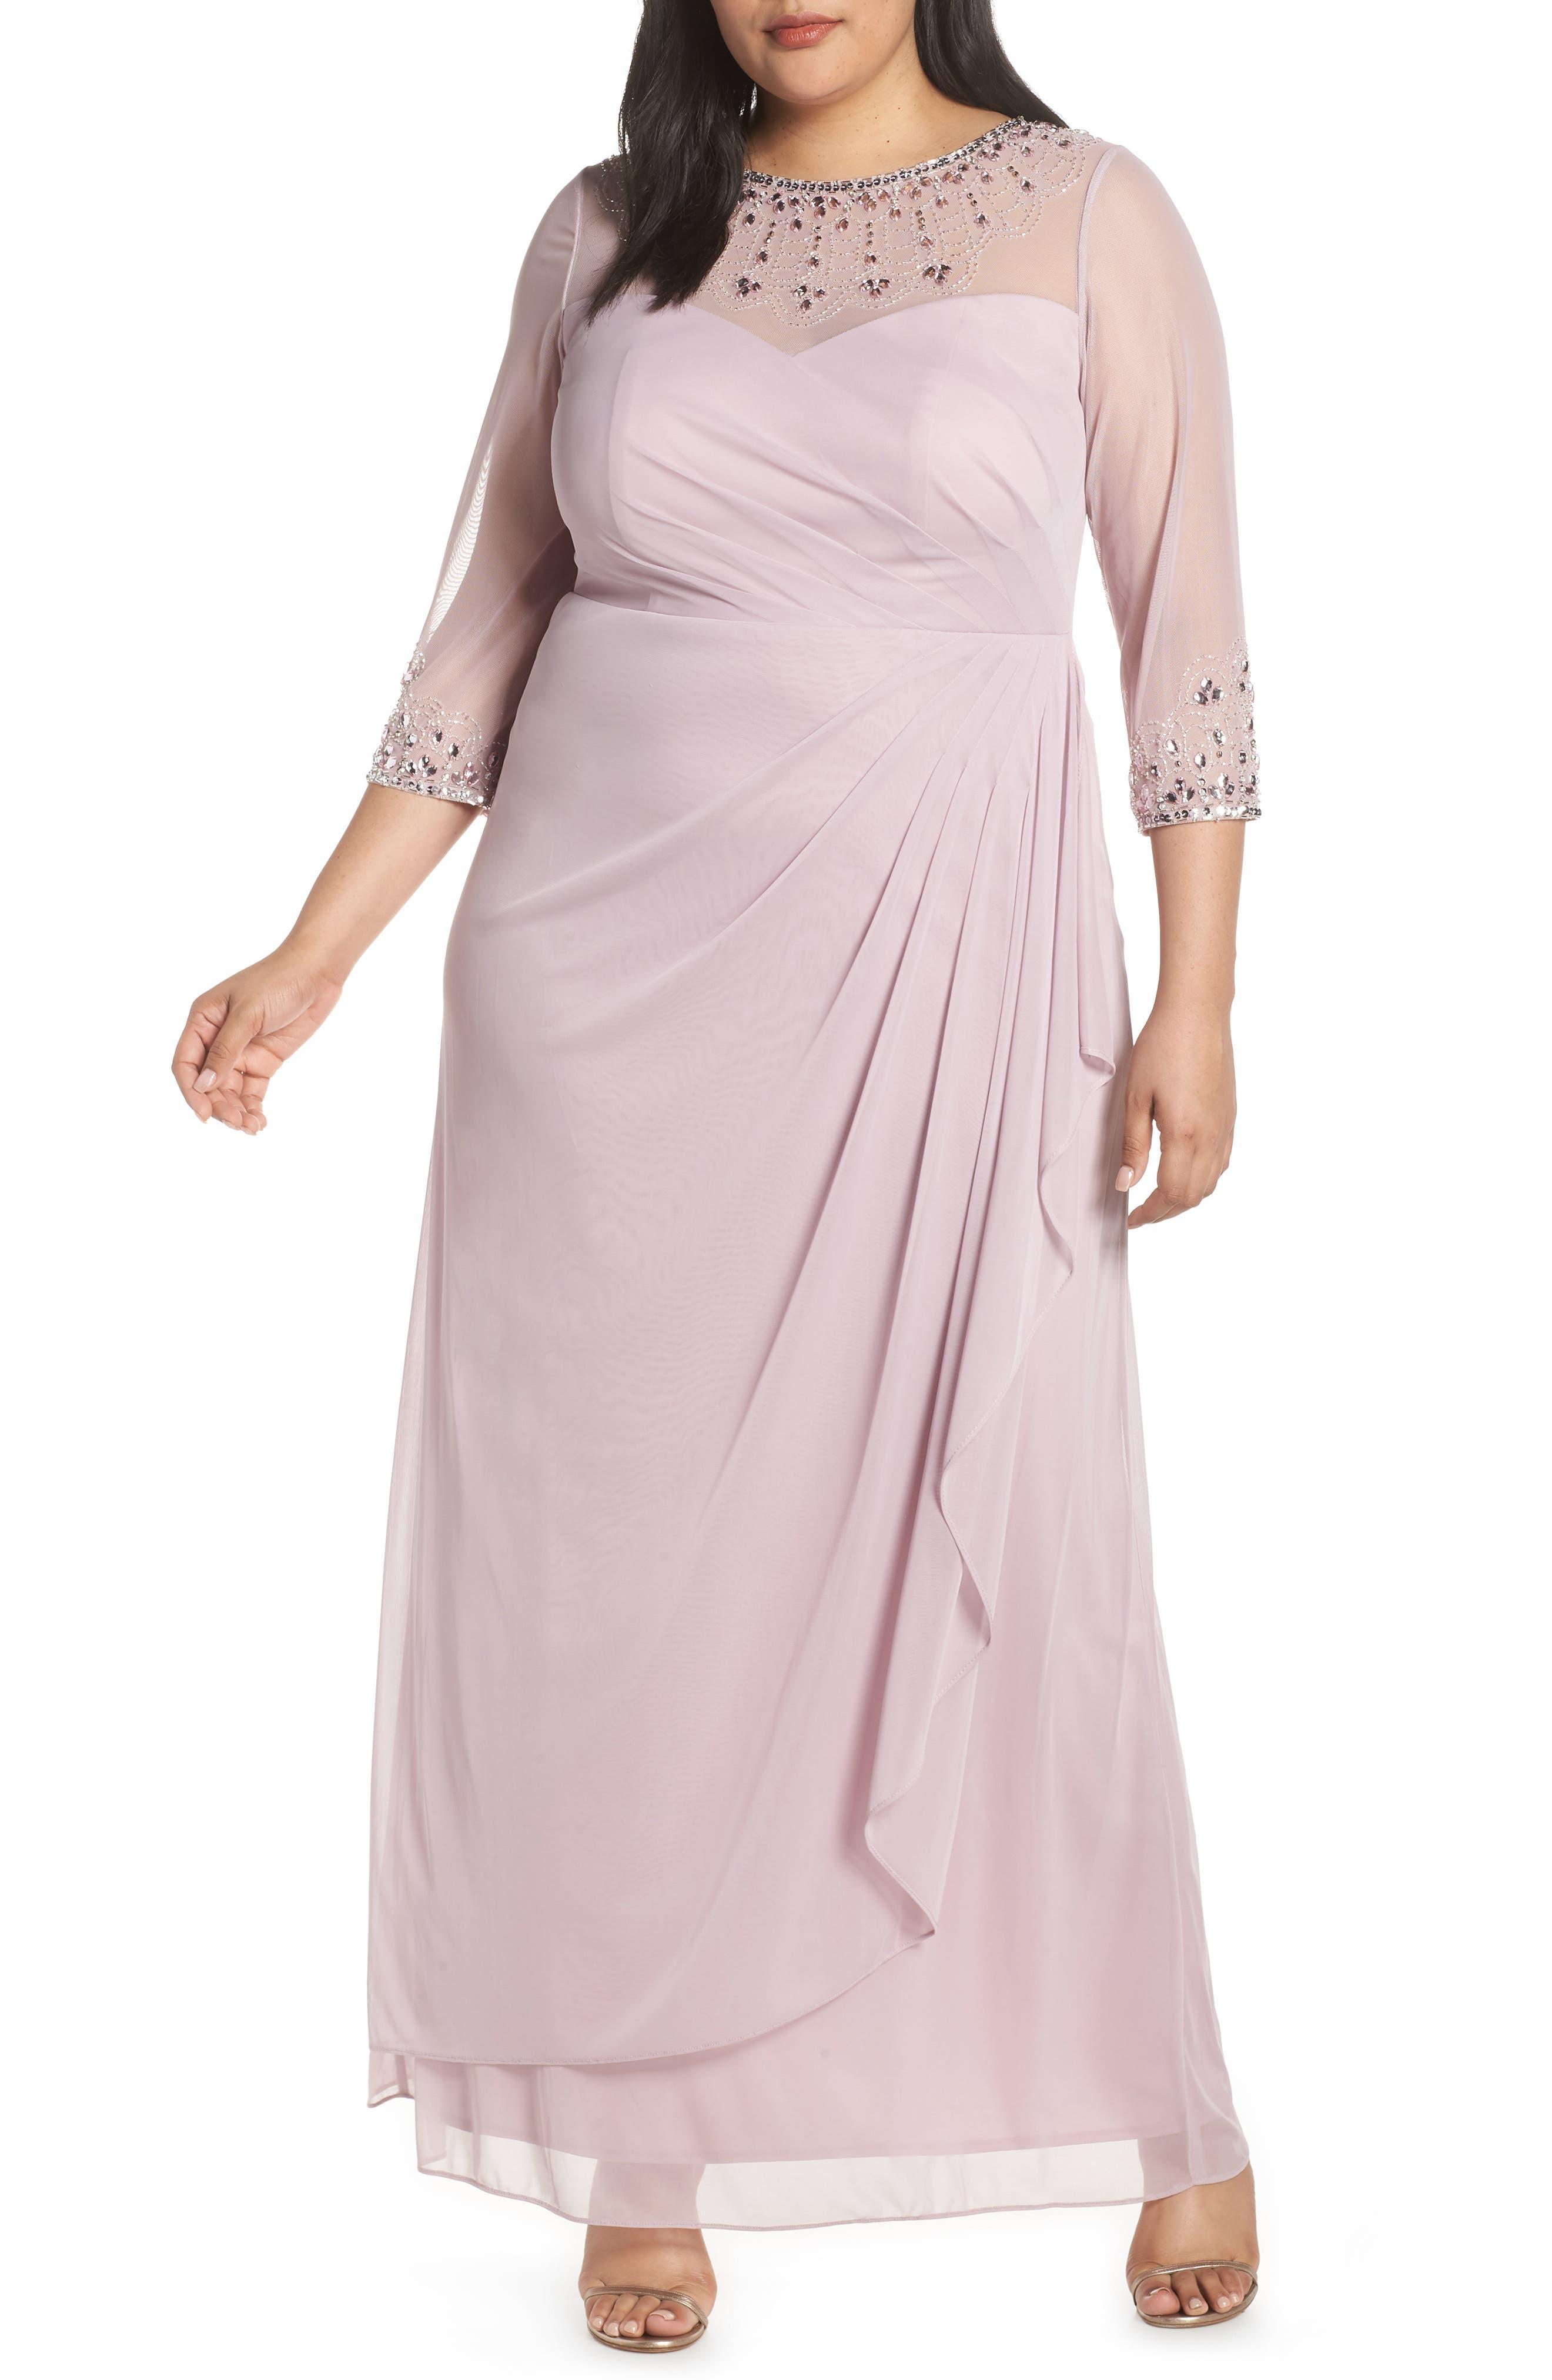 Plus Size Alex Evenings Beaded Illusion Neck A-Line Gown